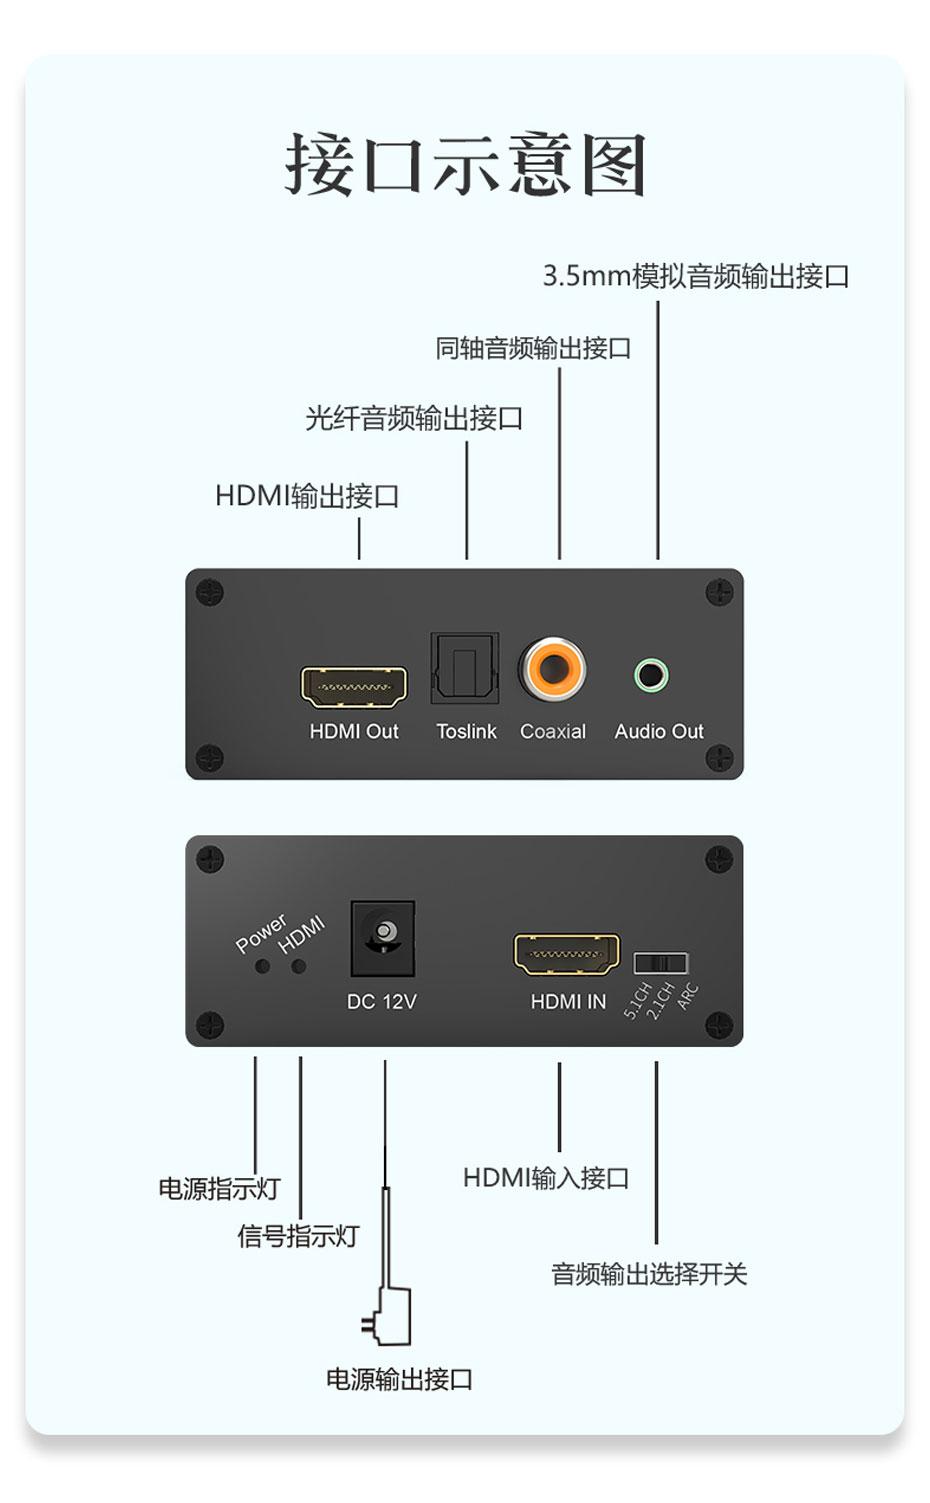 HDMI音频分离器HHA接口说明